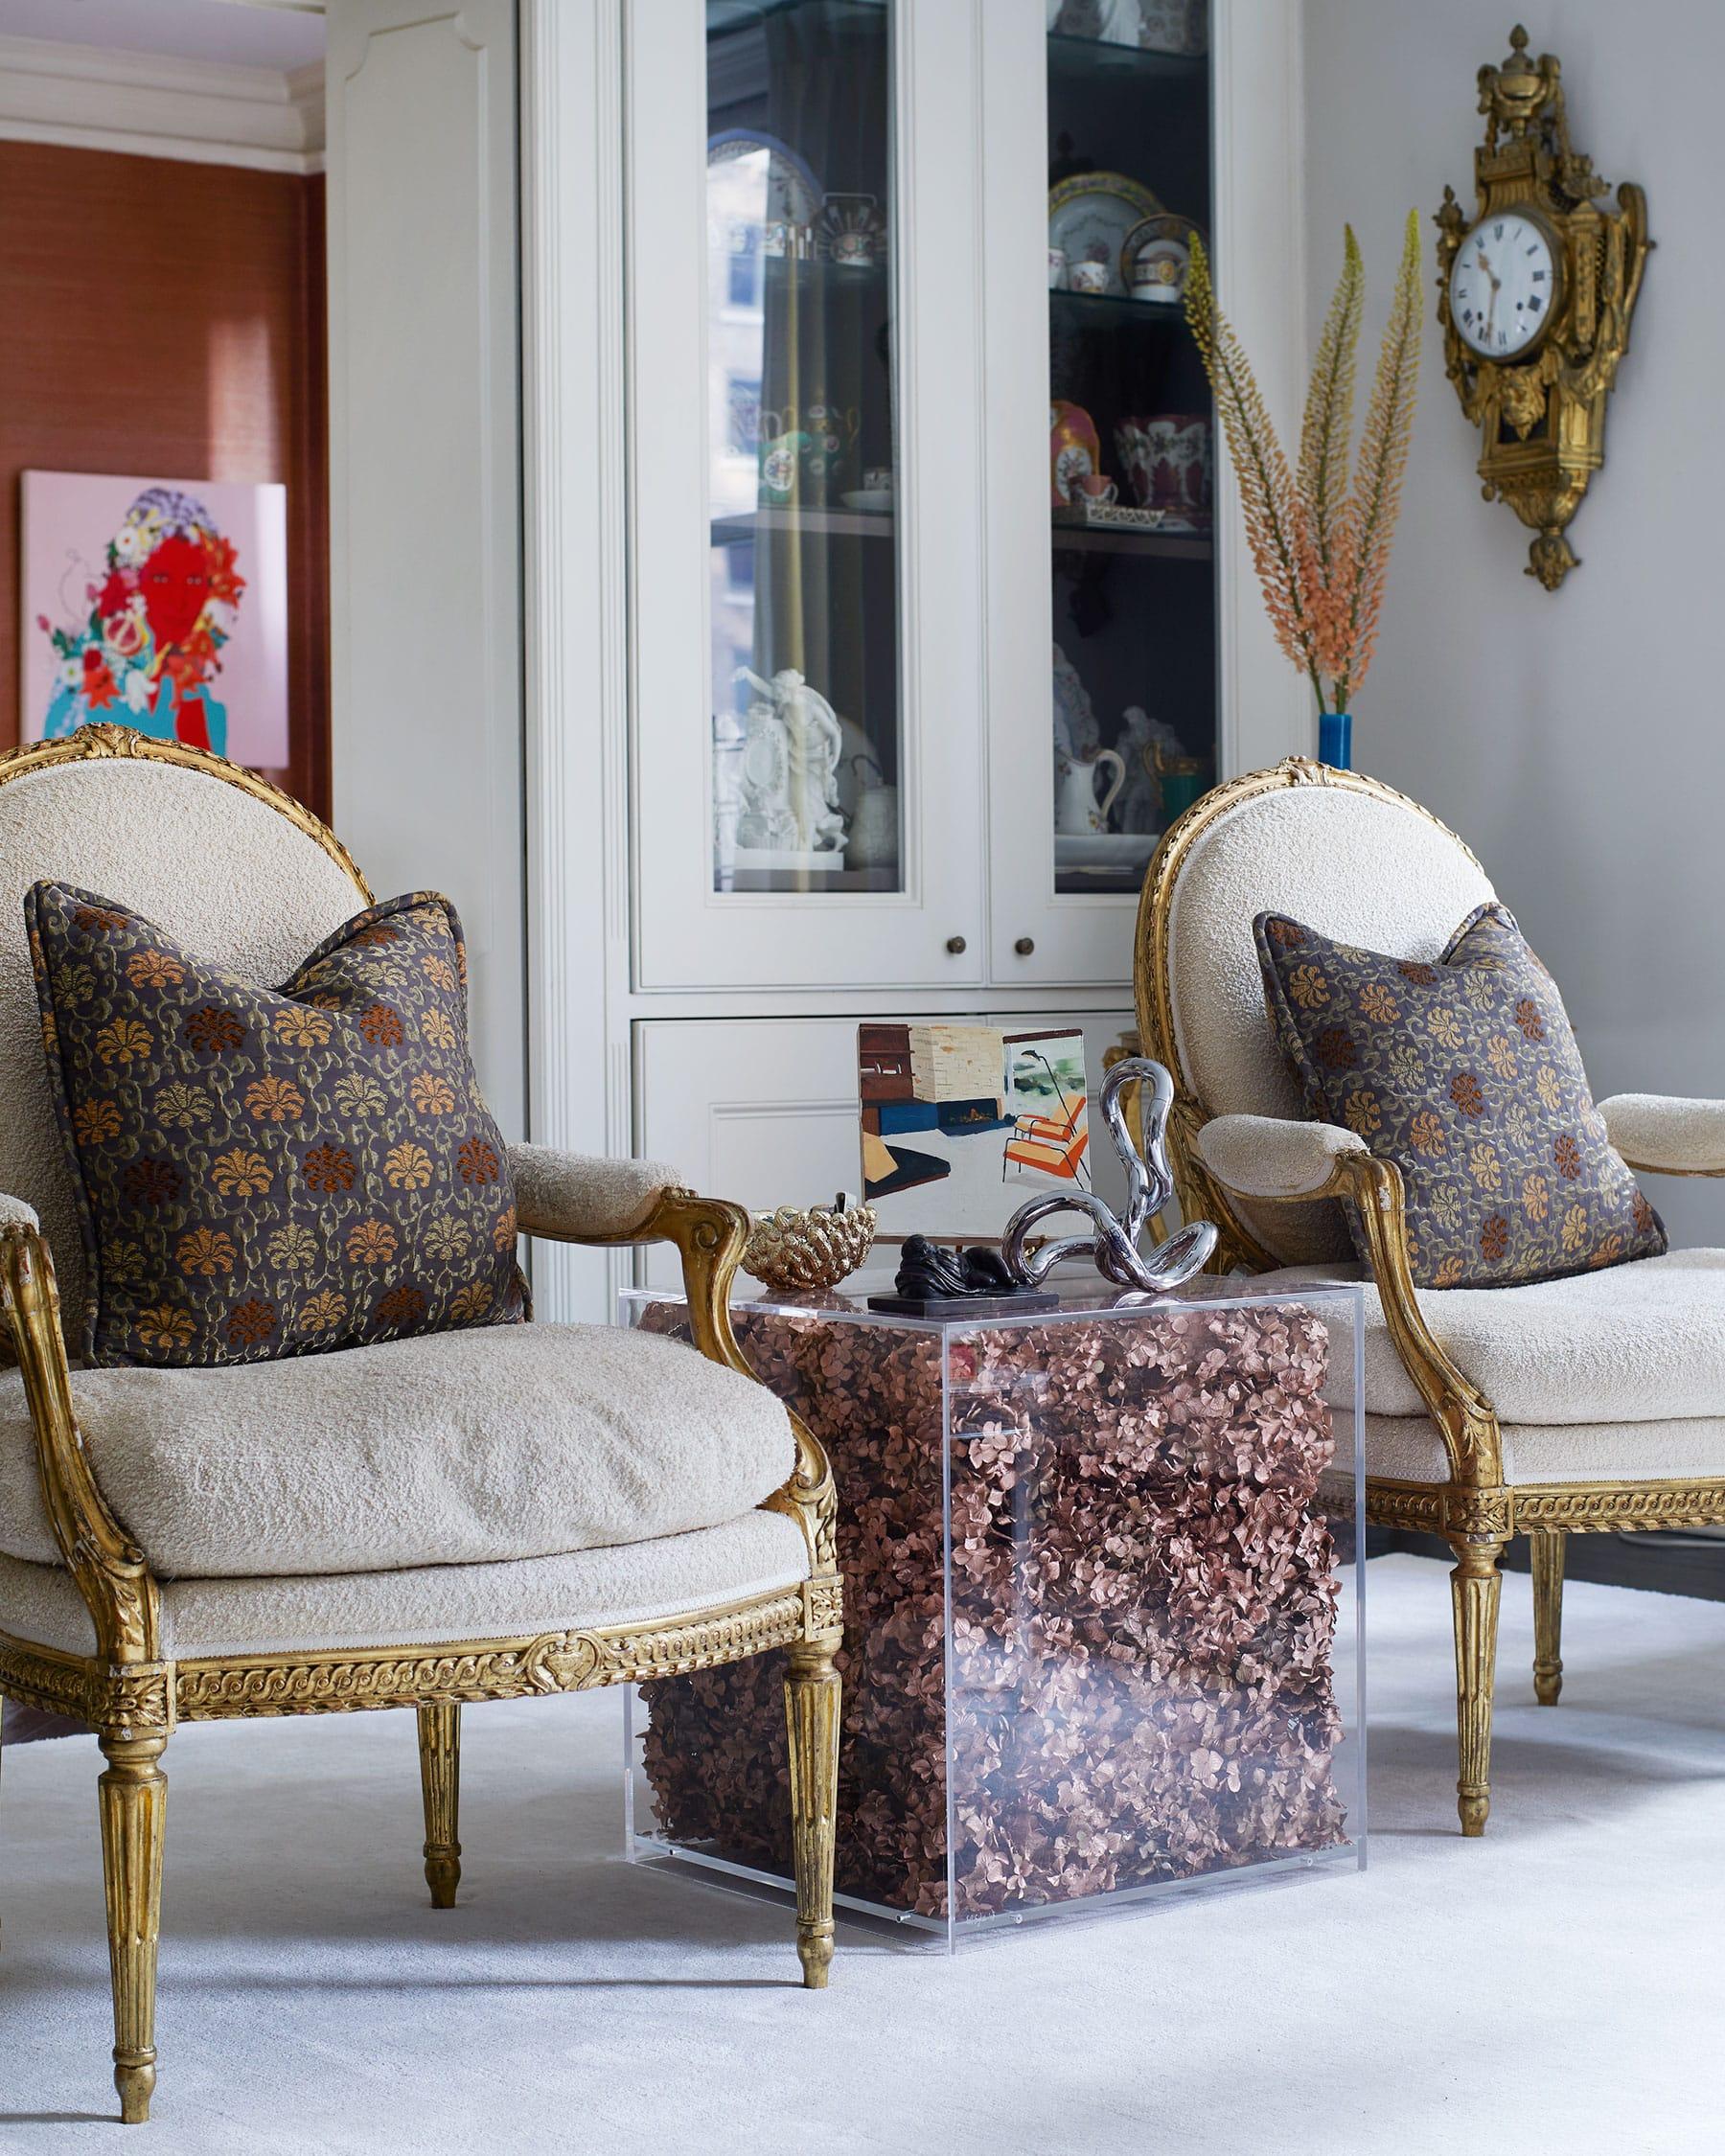 Blair Voltz Clarke and Alistair Clarke New York apartment living room